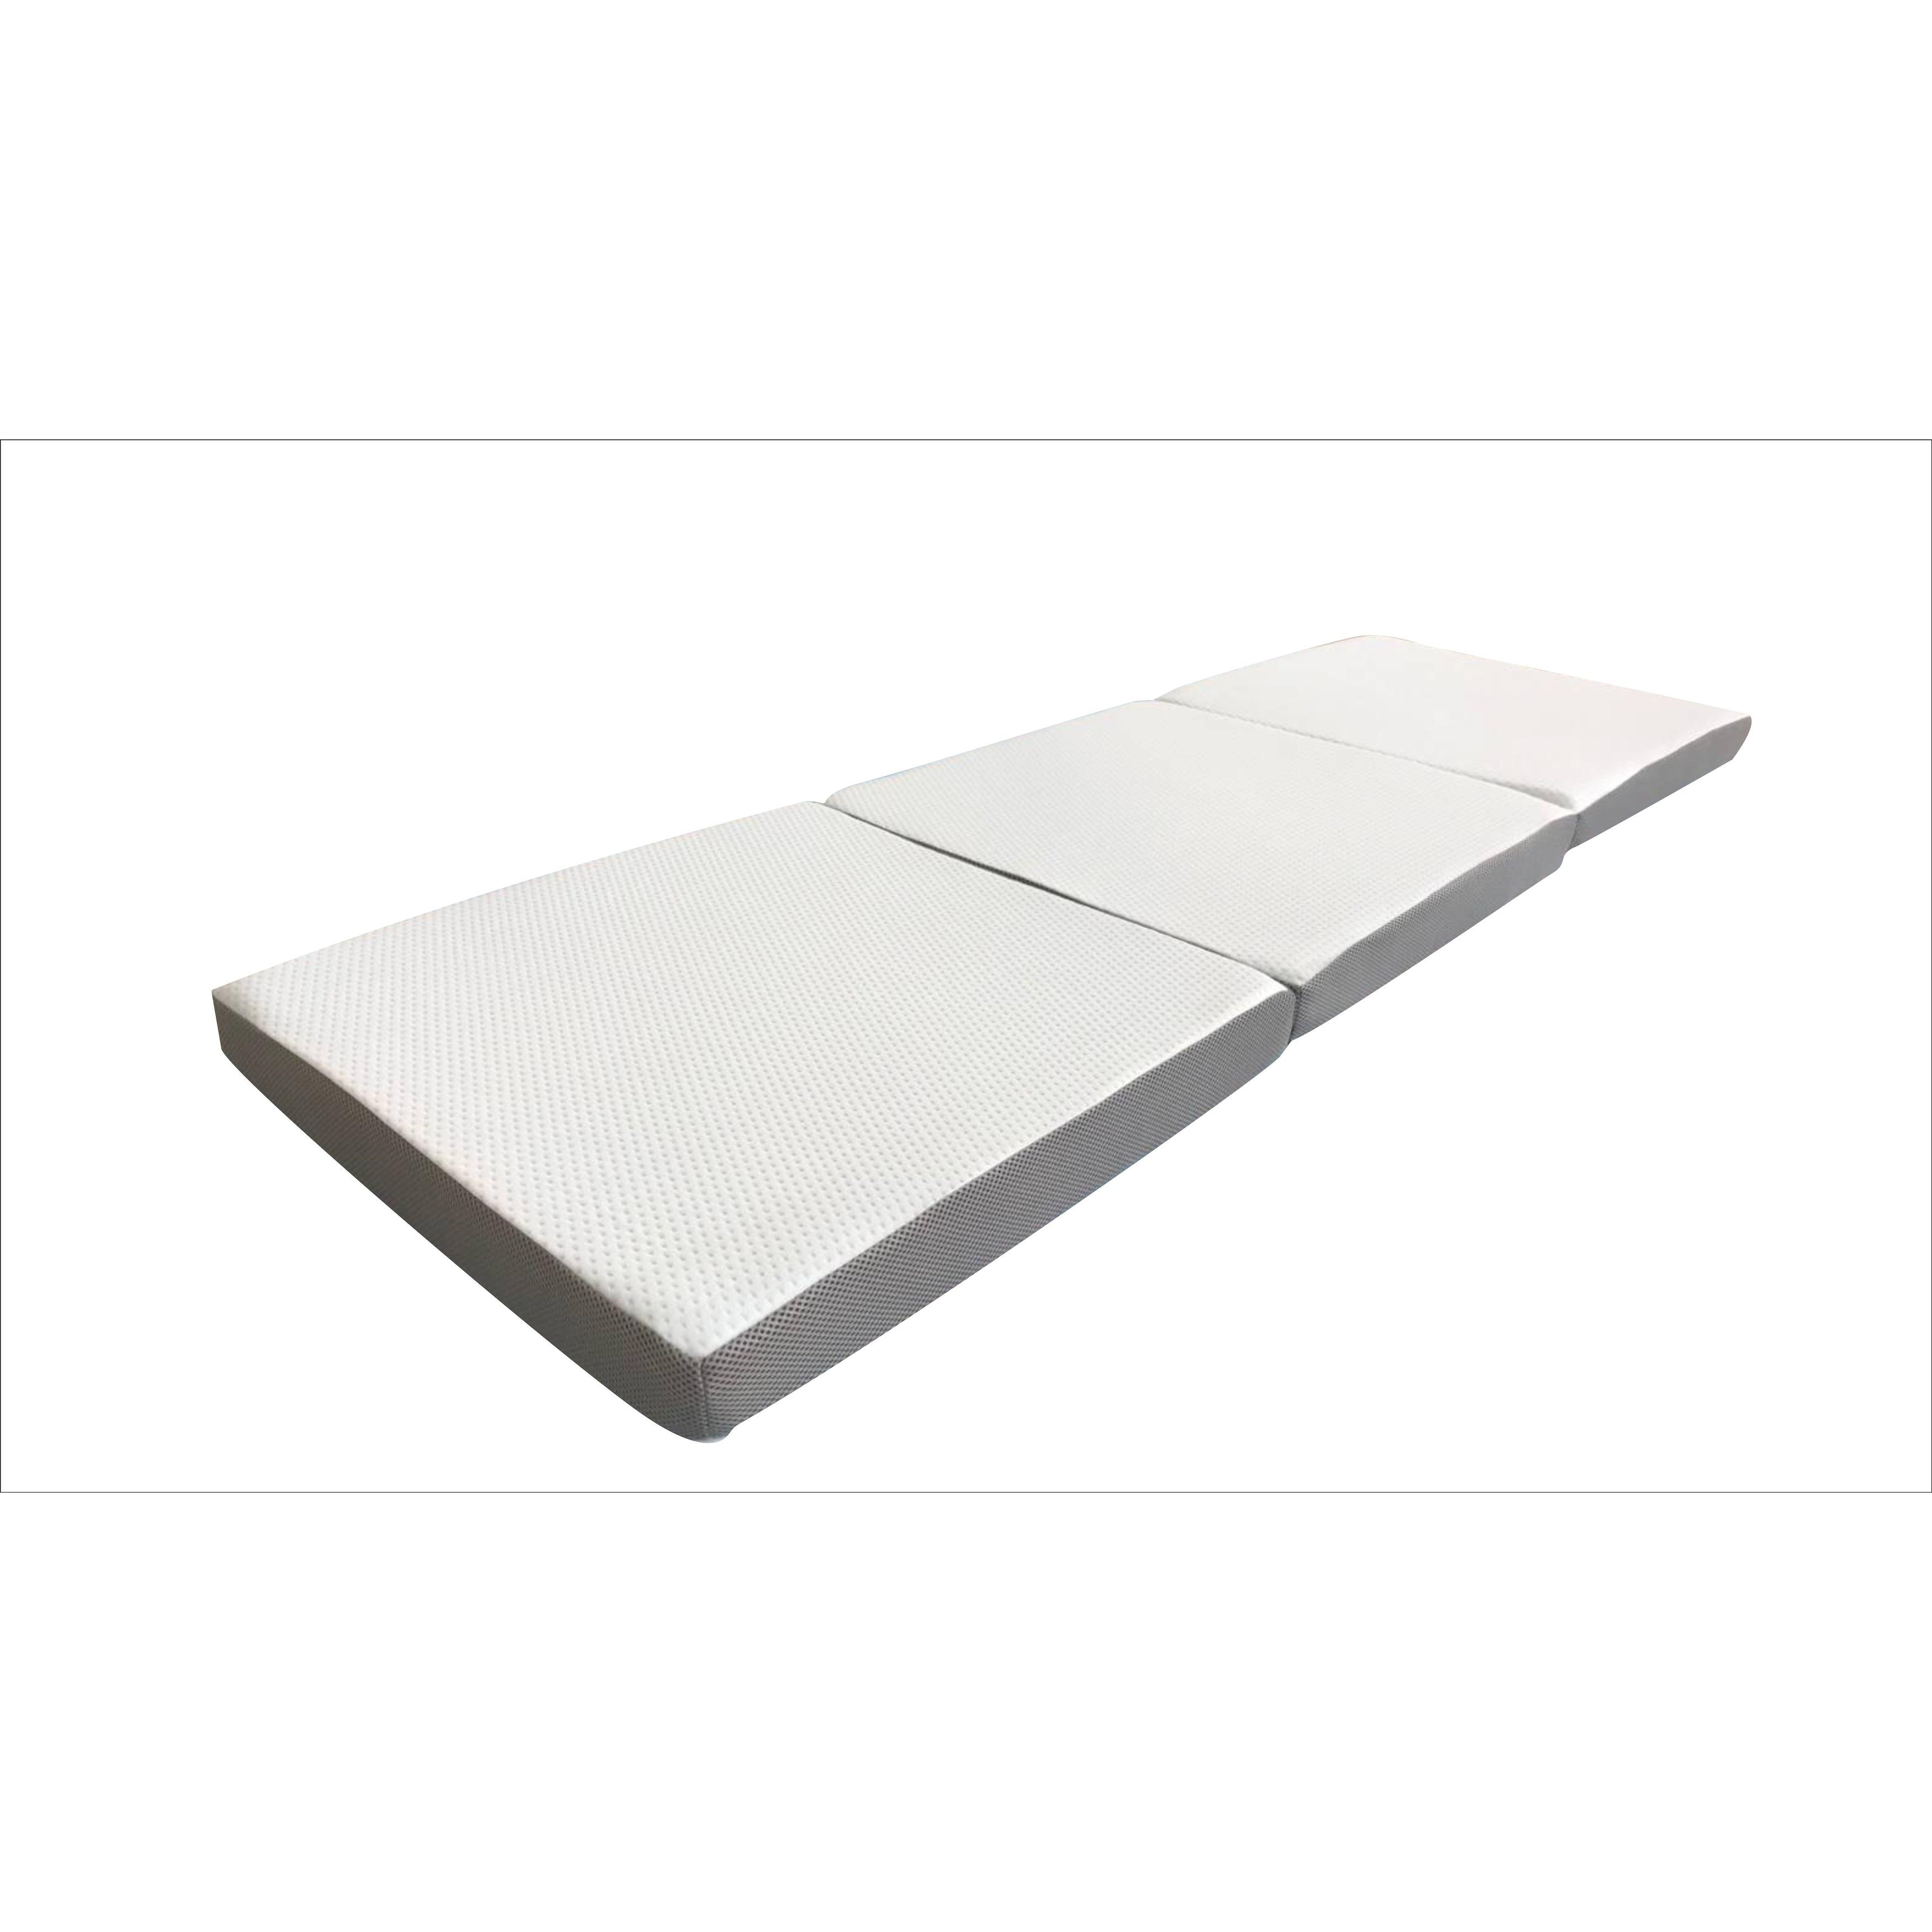 Folding Mattress 3 Inch Memory Foam